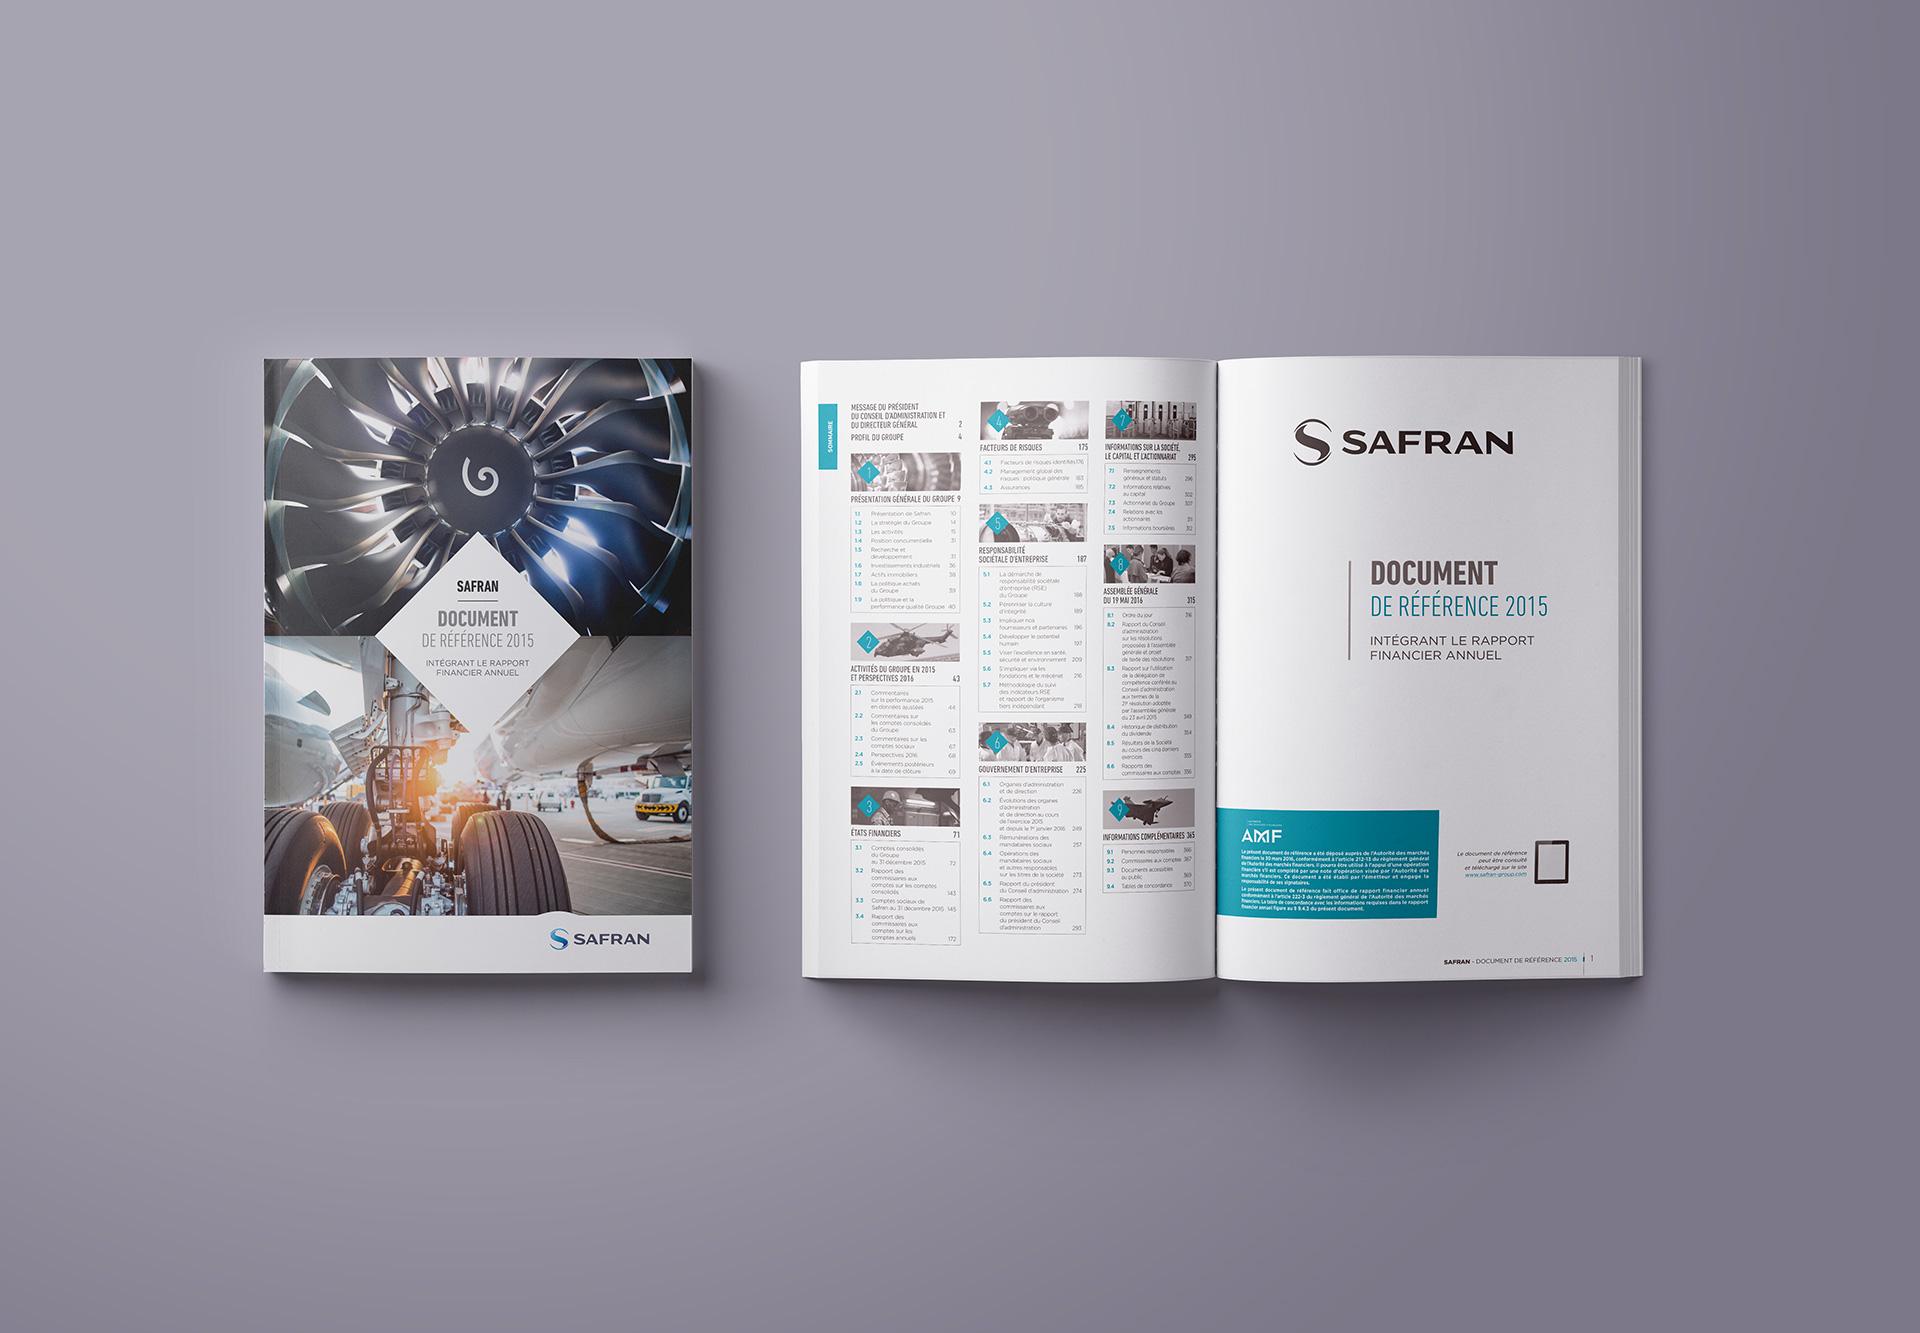 Safran_003_001